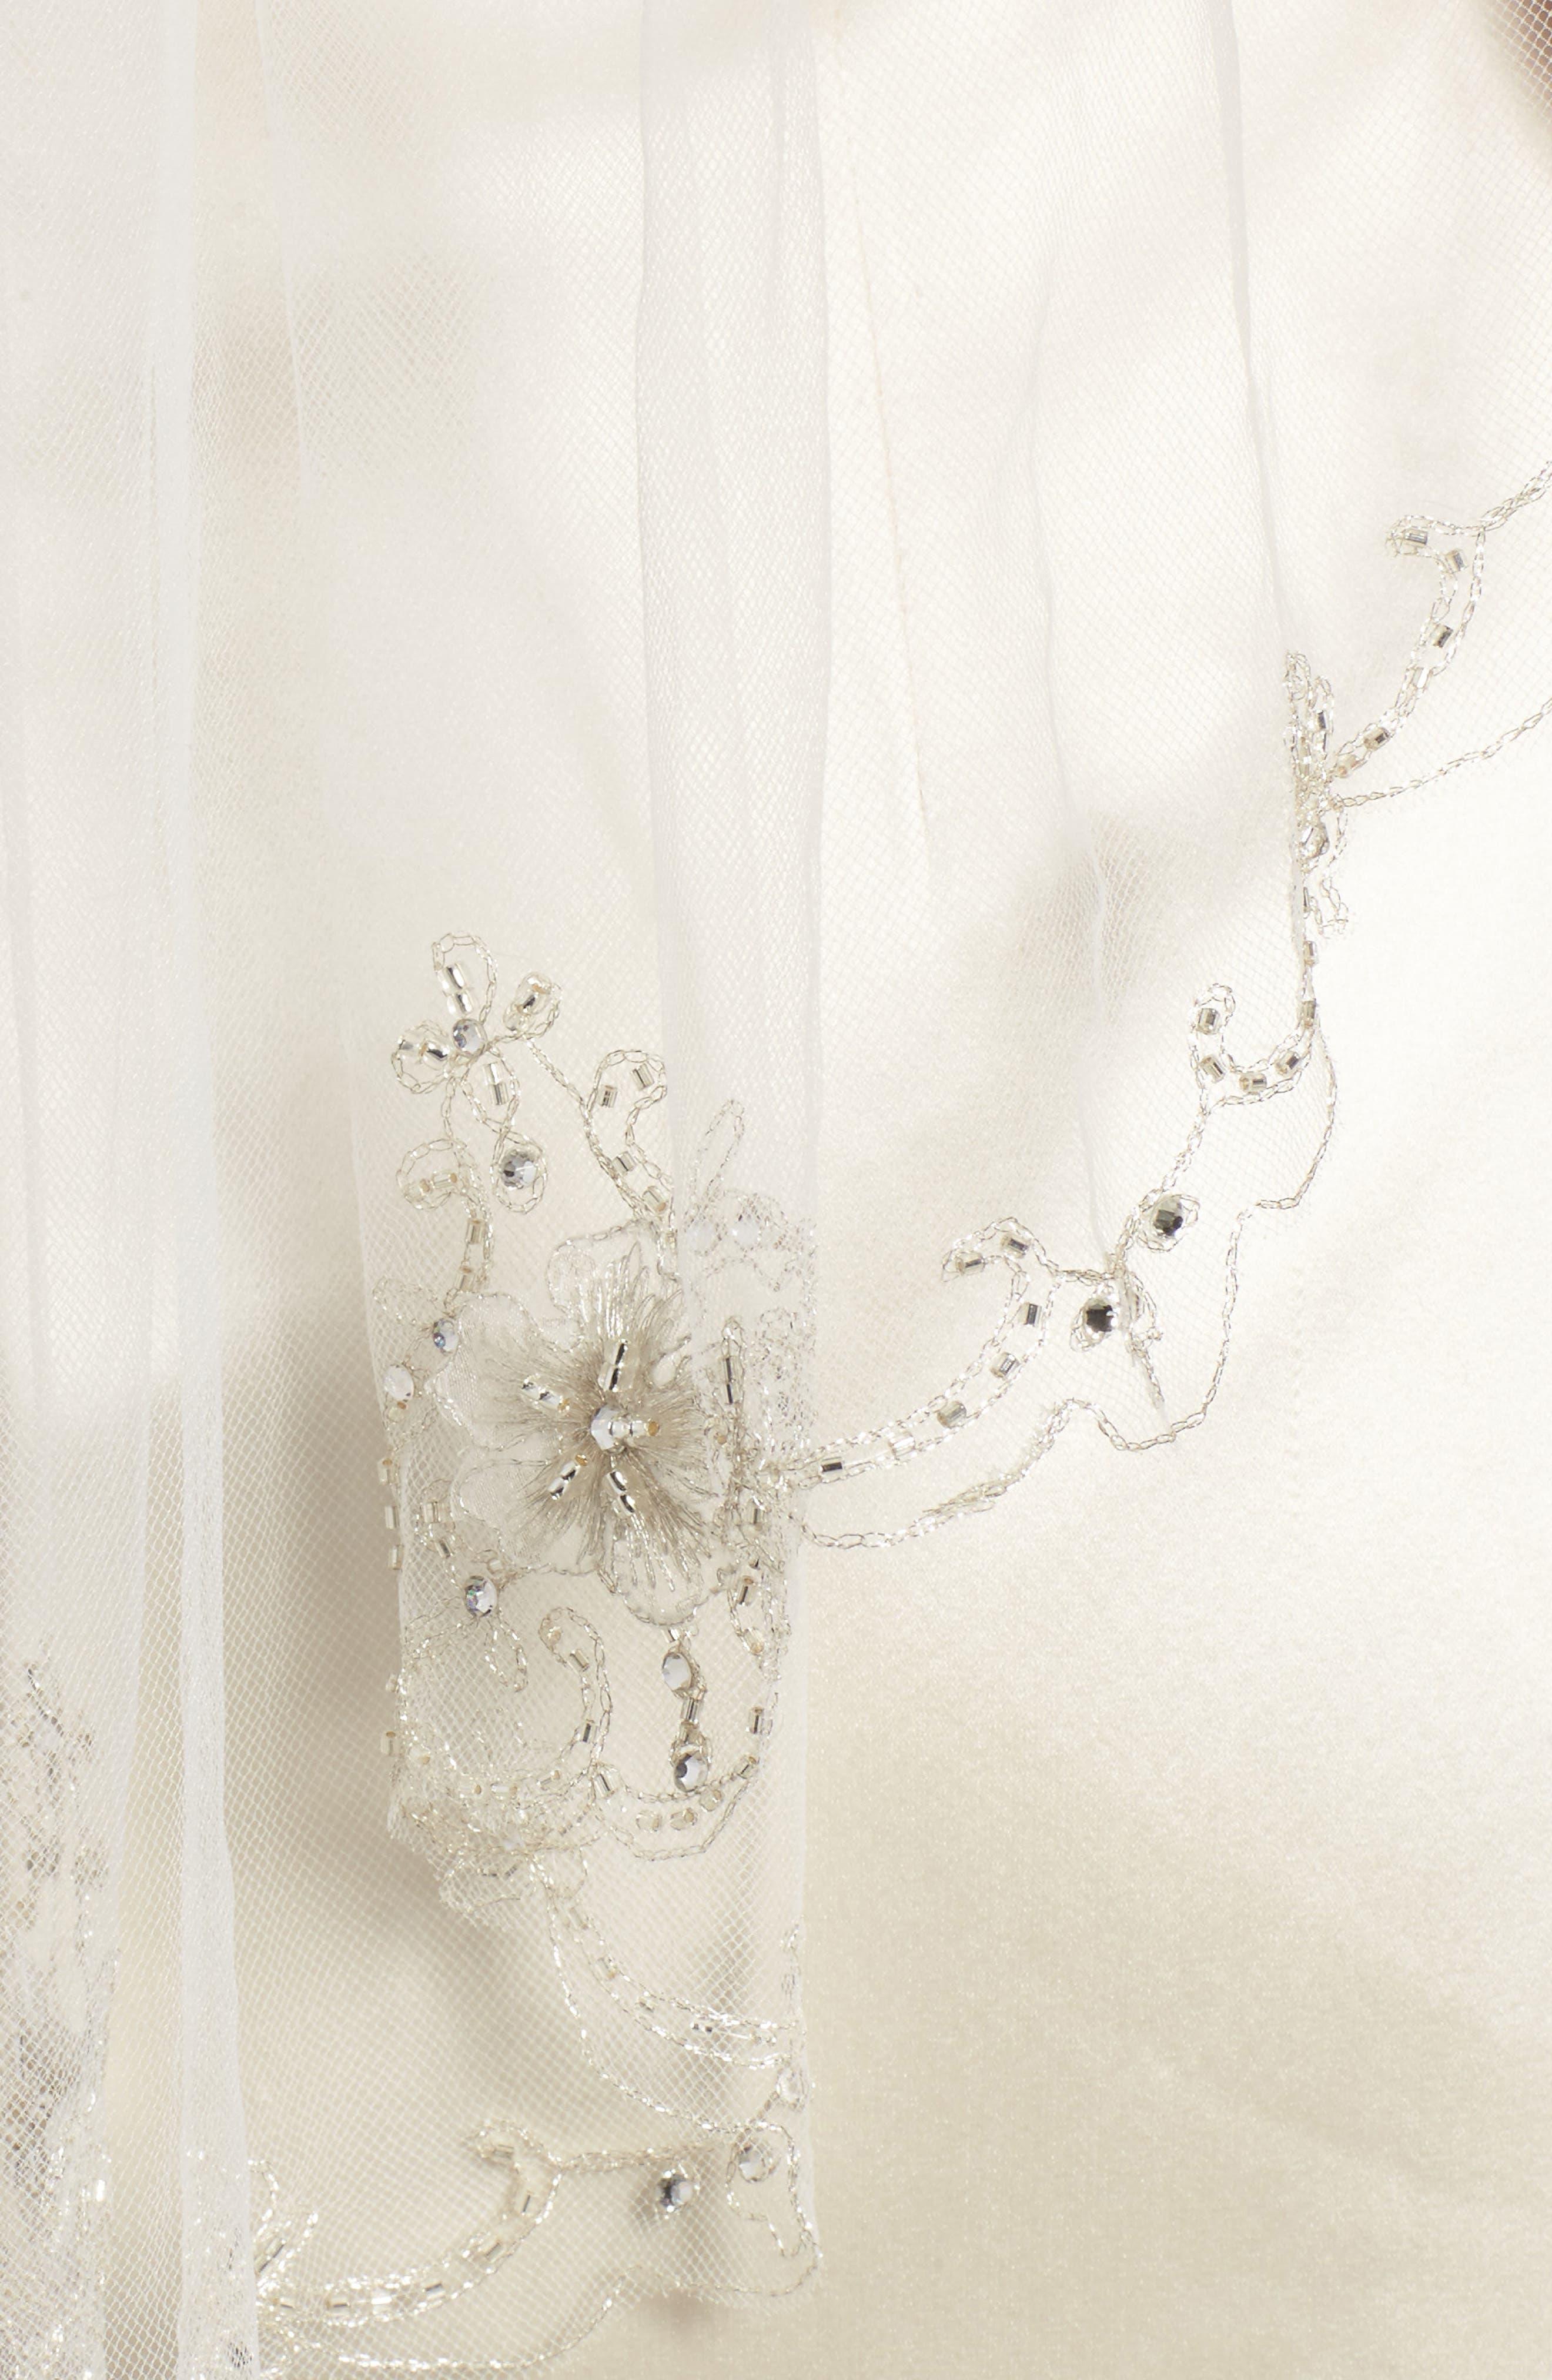 Marina Embellished Veil,                             Alternate thumbnail 2, color,                             901